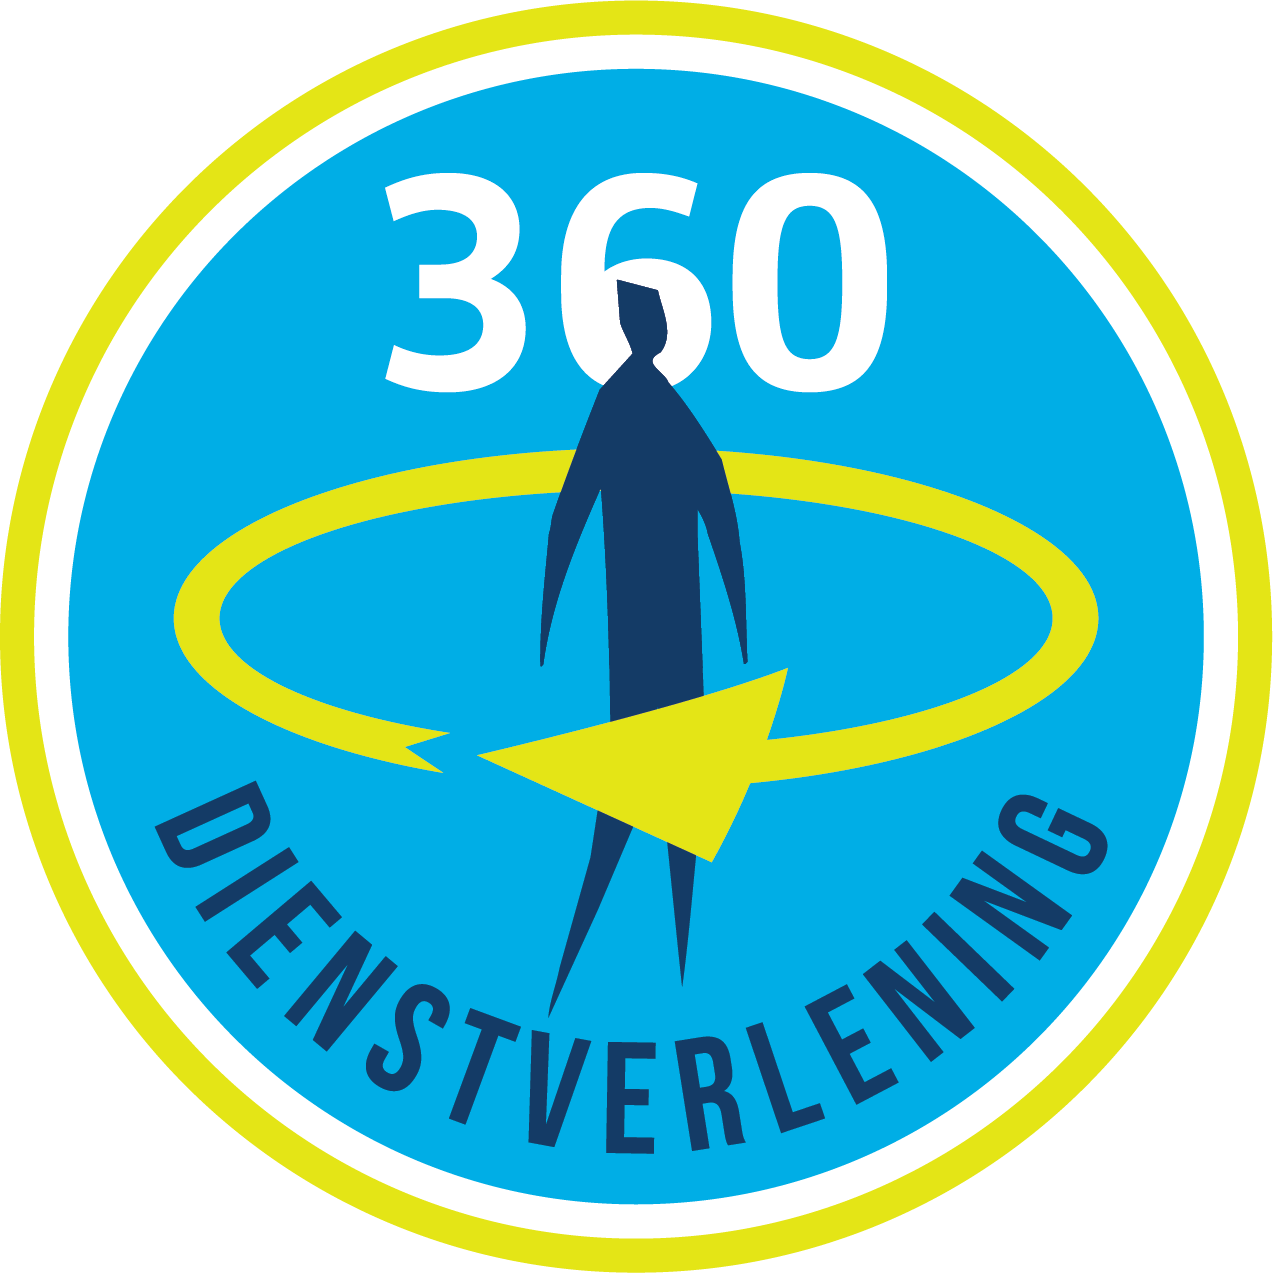 aclvb-universele_diensten-logo-cmyk_ok-2_2.png